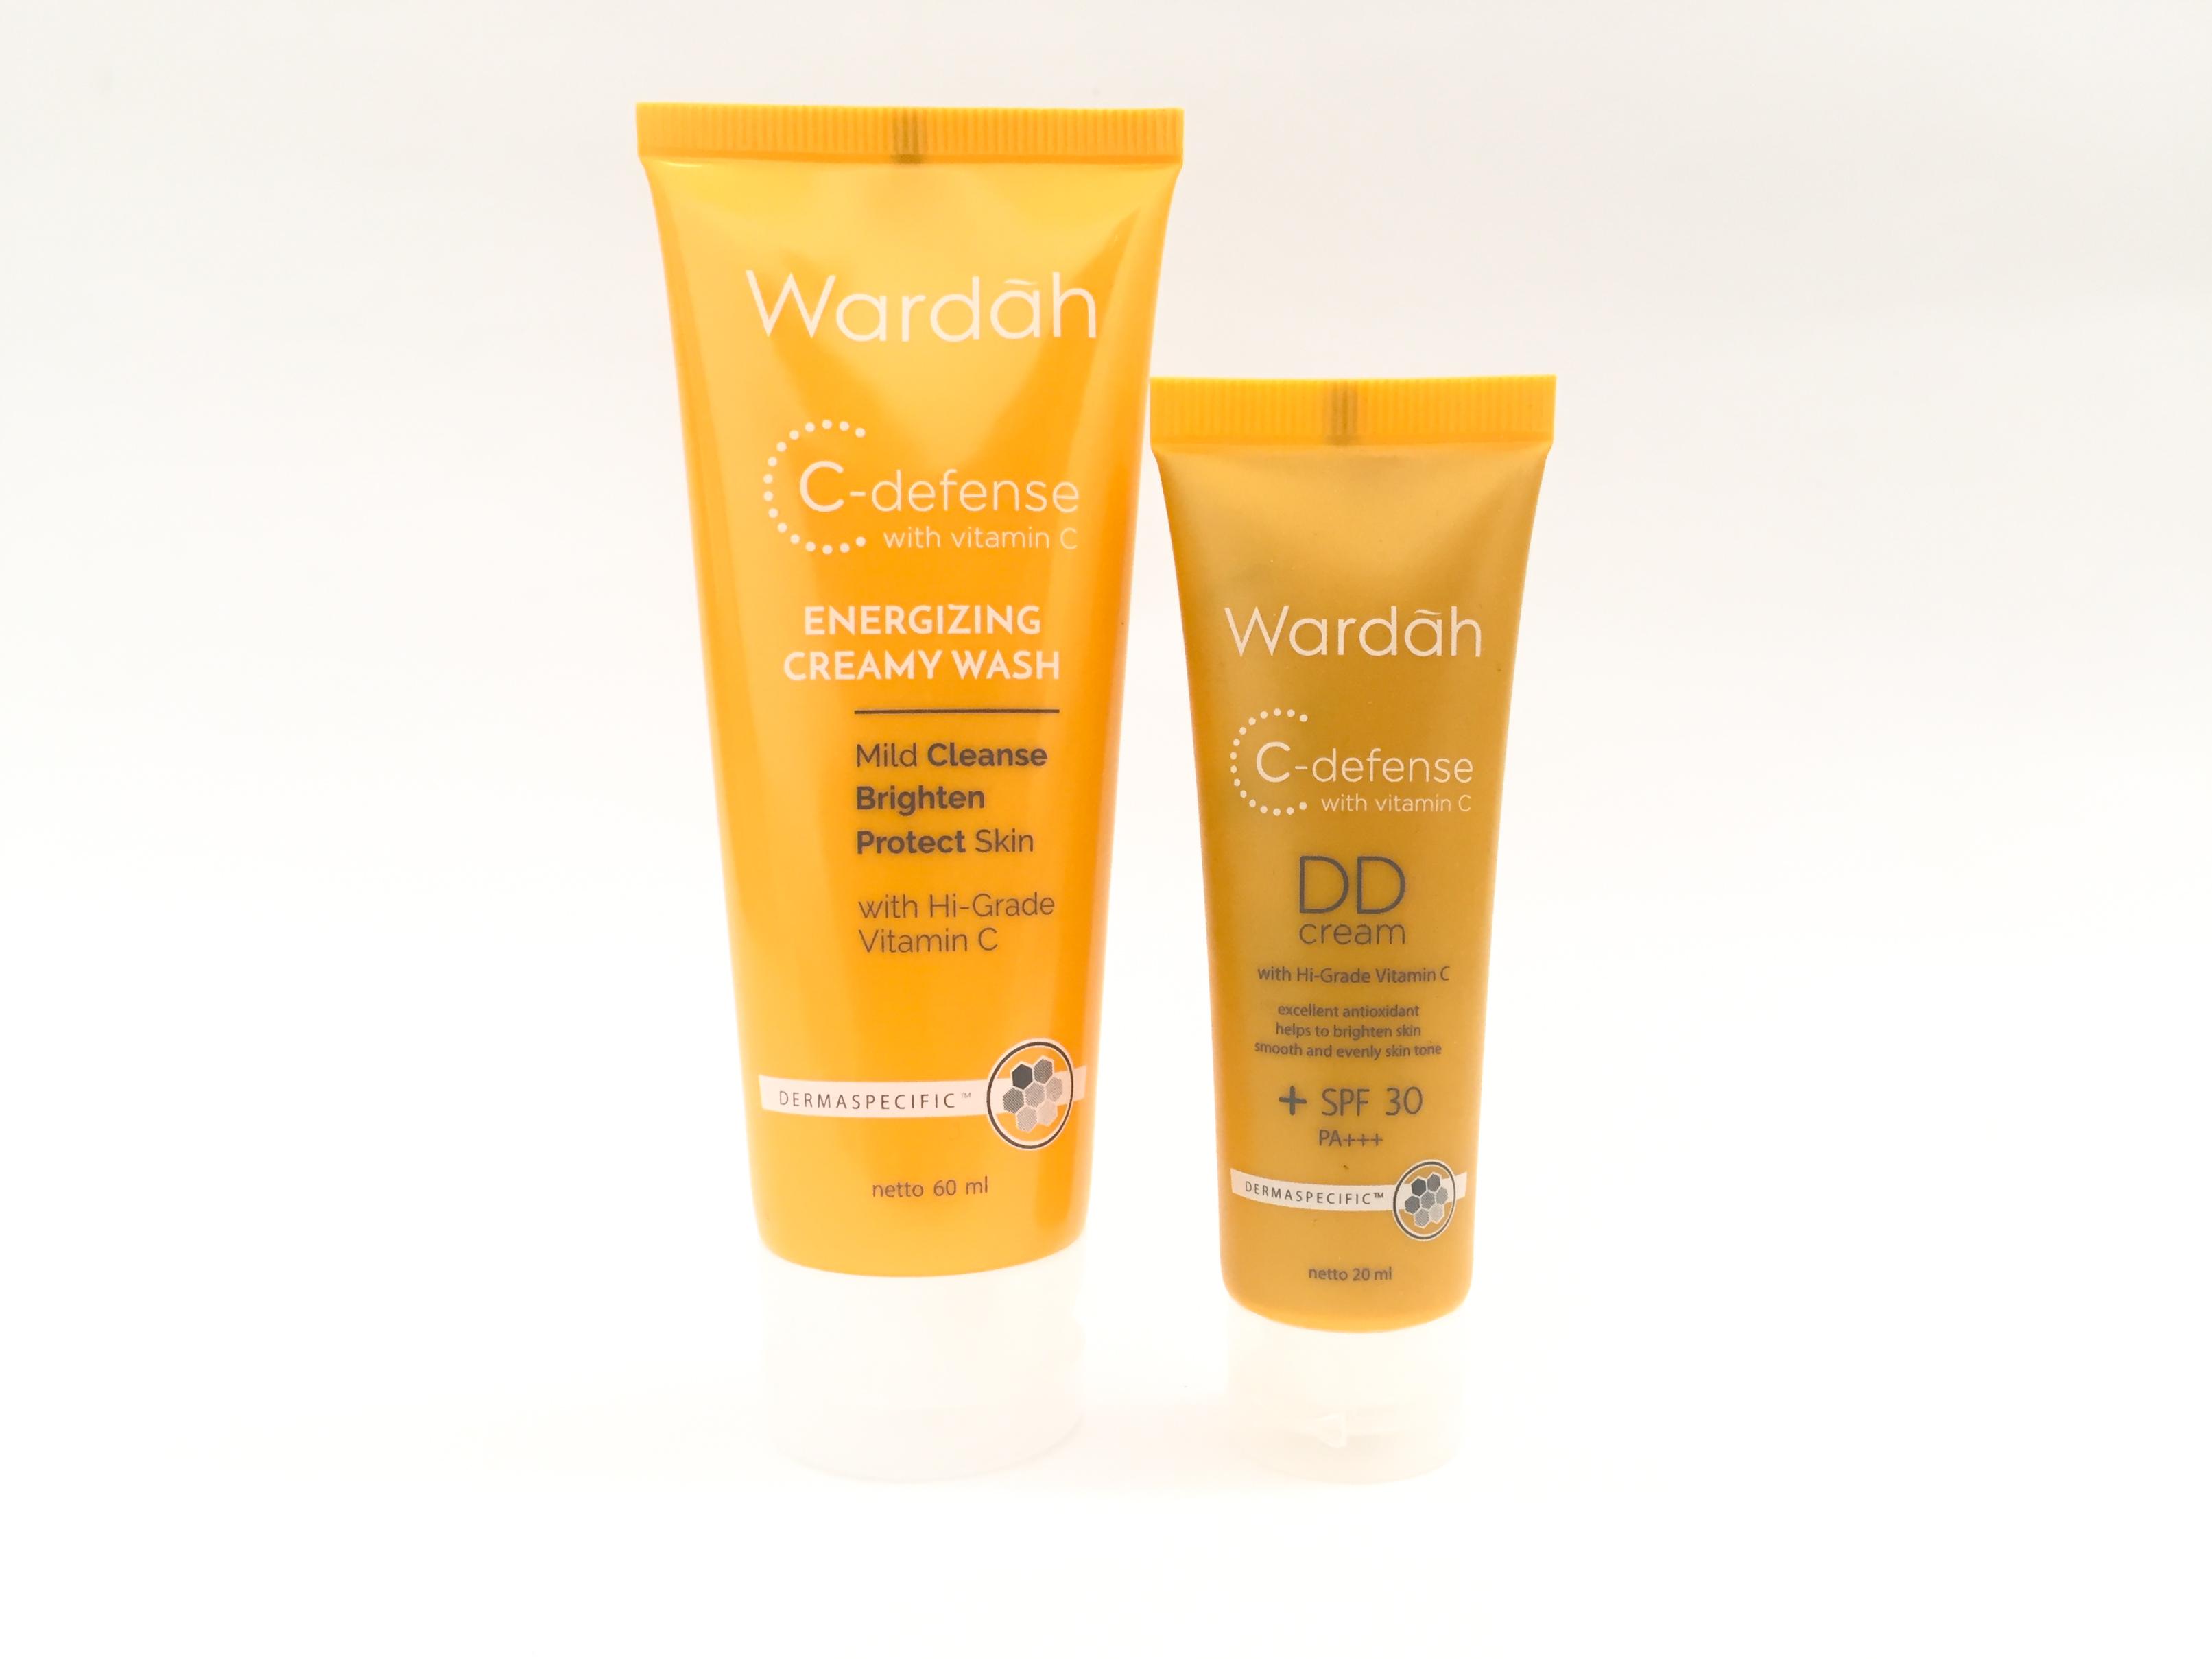 Review: Wardah C-Defense DD Cream & Energizing Creamy Wash